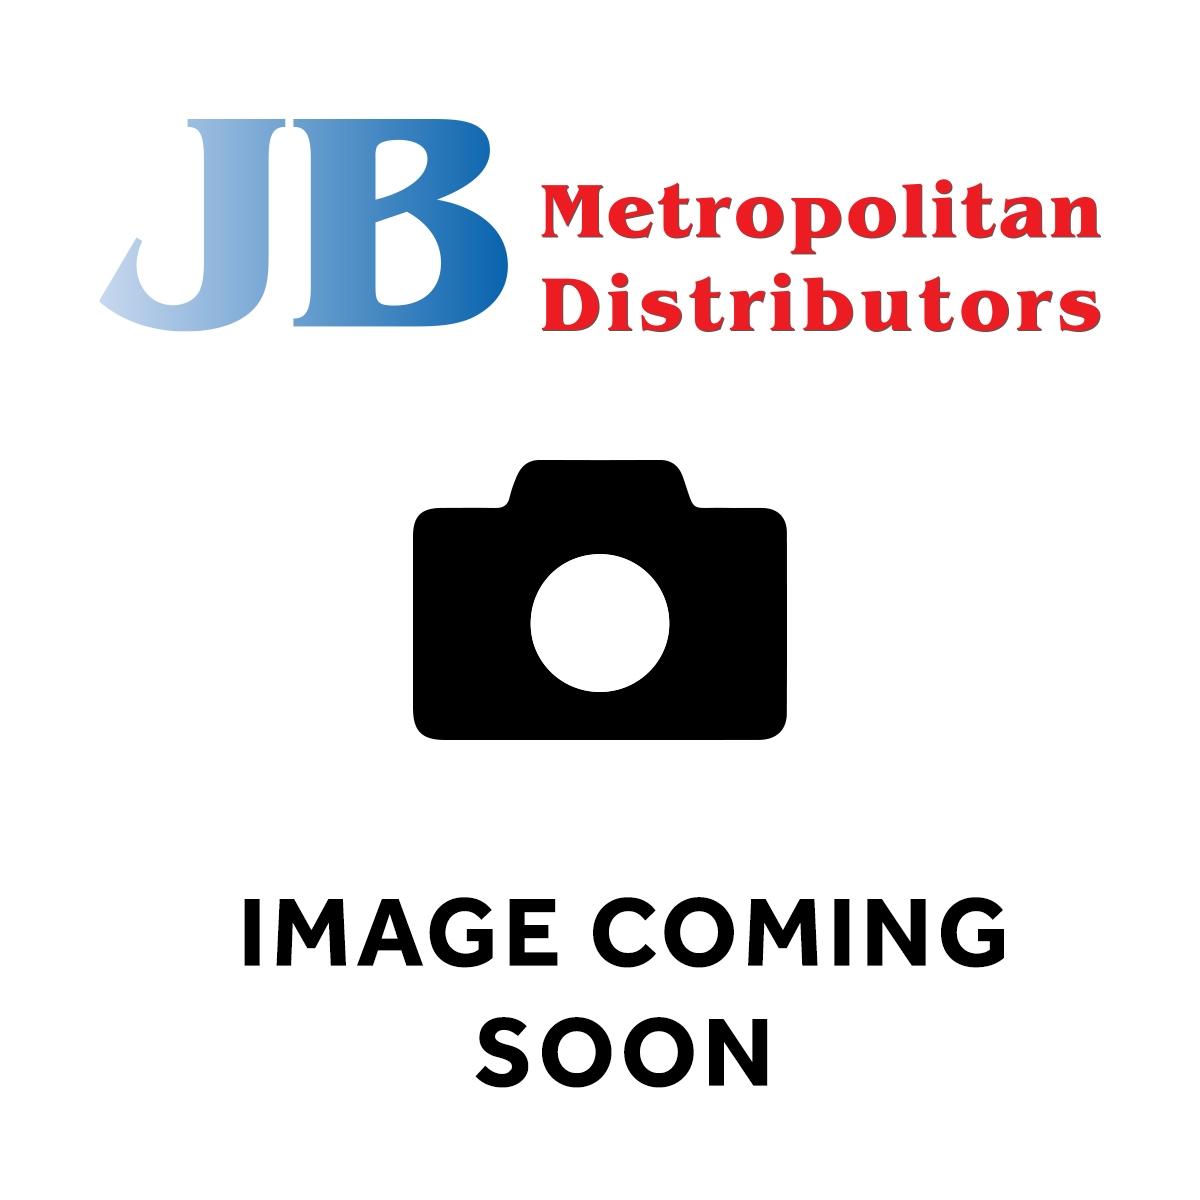 175G MARSHMALLOW SANTA SHAREPACK